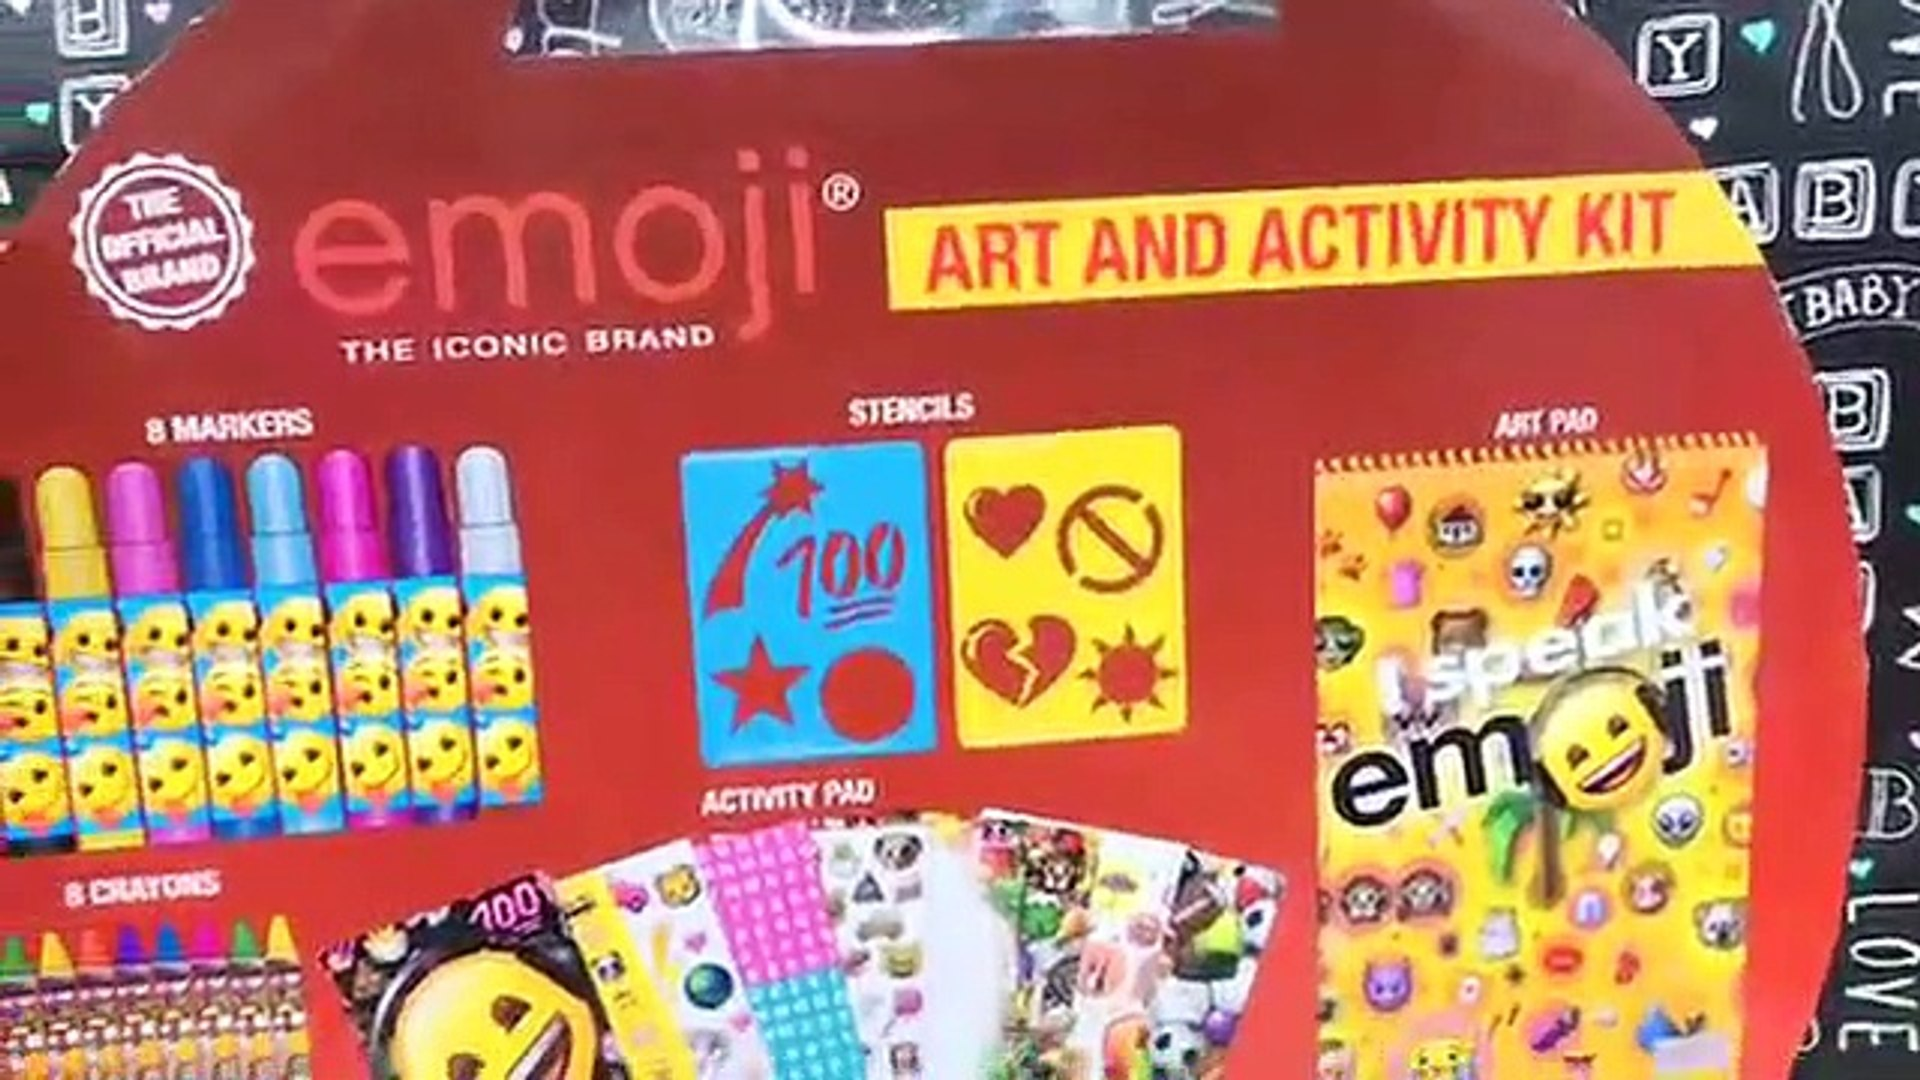 Emoji Art And Activity Kit For Kids Creativity _ itspl